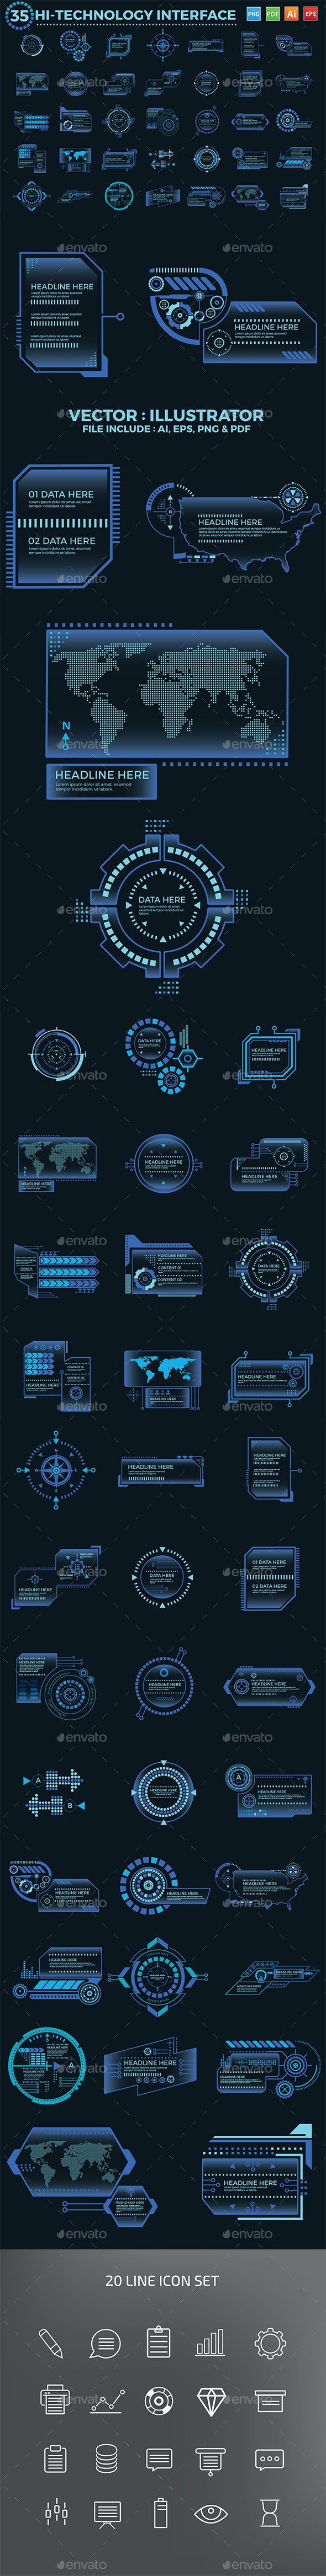 Hi-Technology Interface Design - Vectors